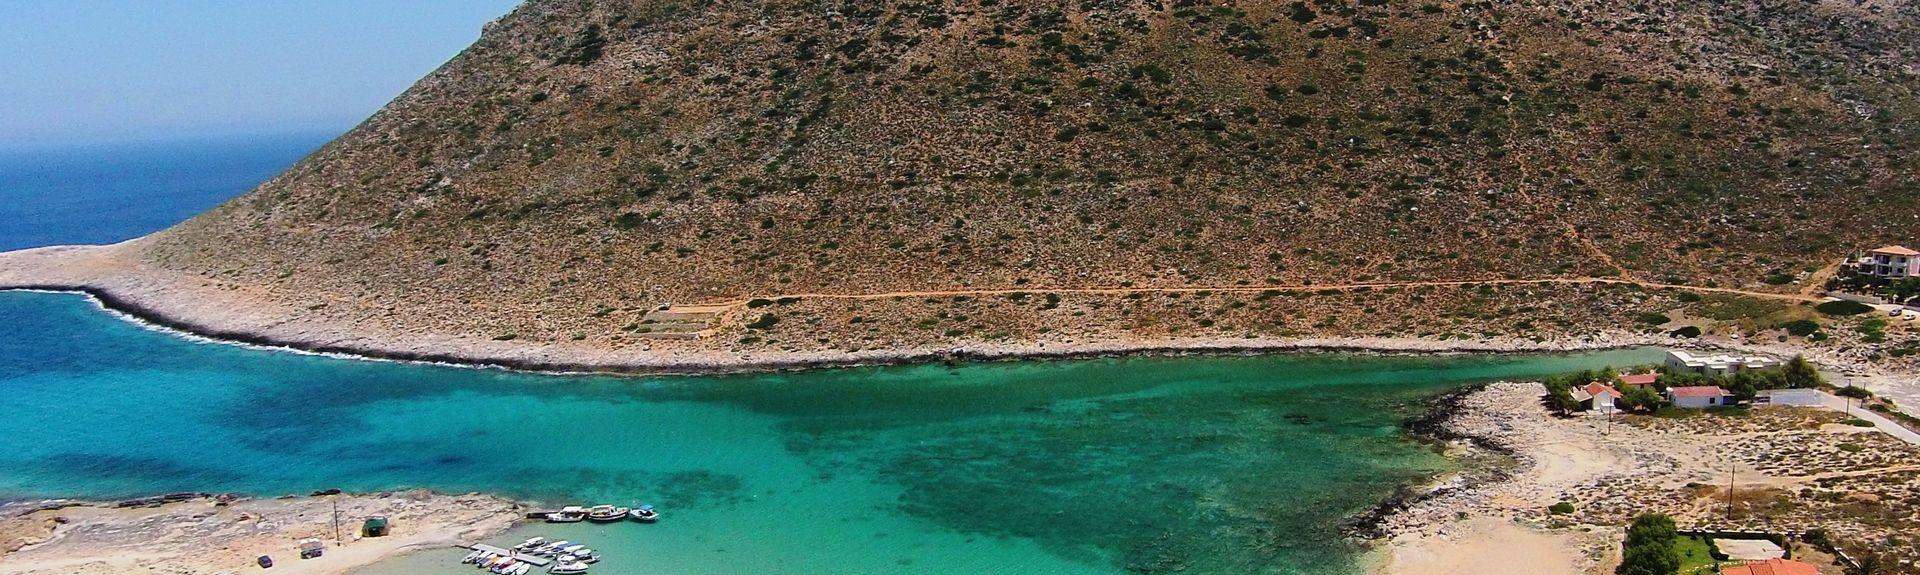 Aspro, Apokoronas, Crète, Grèce